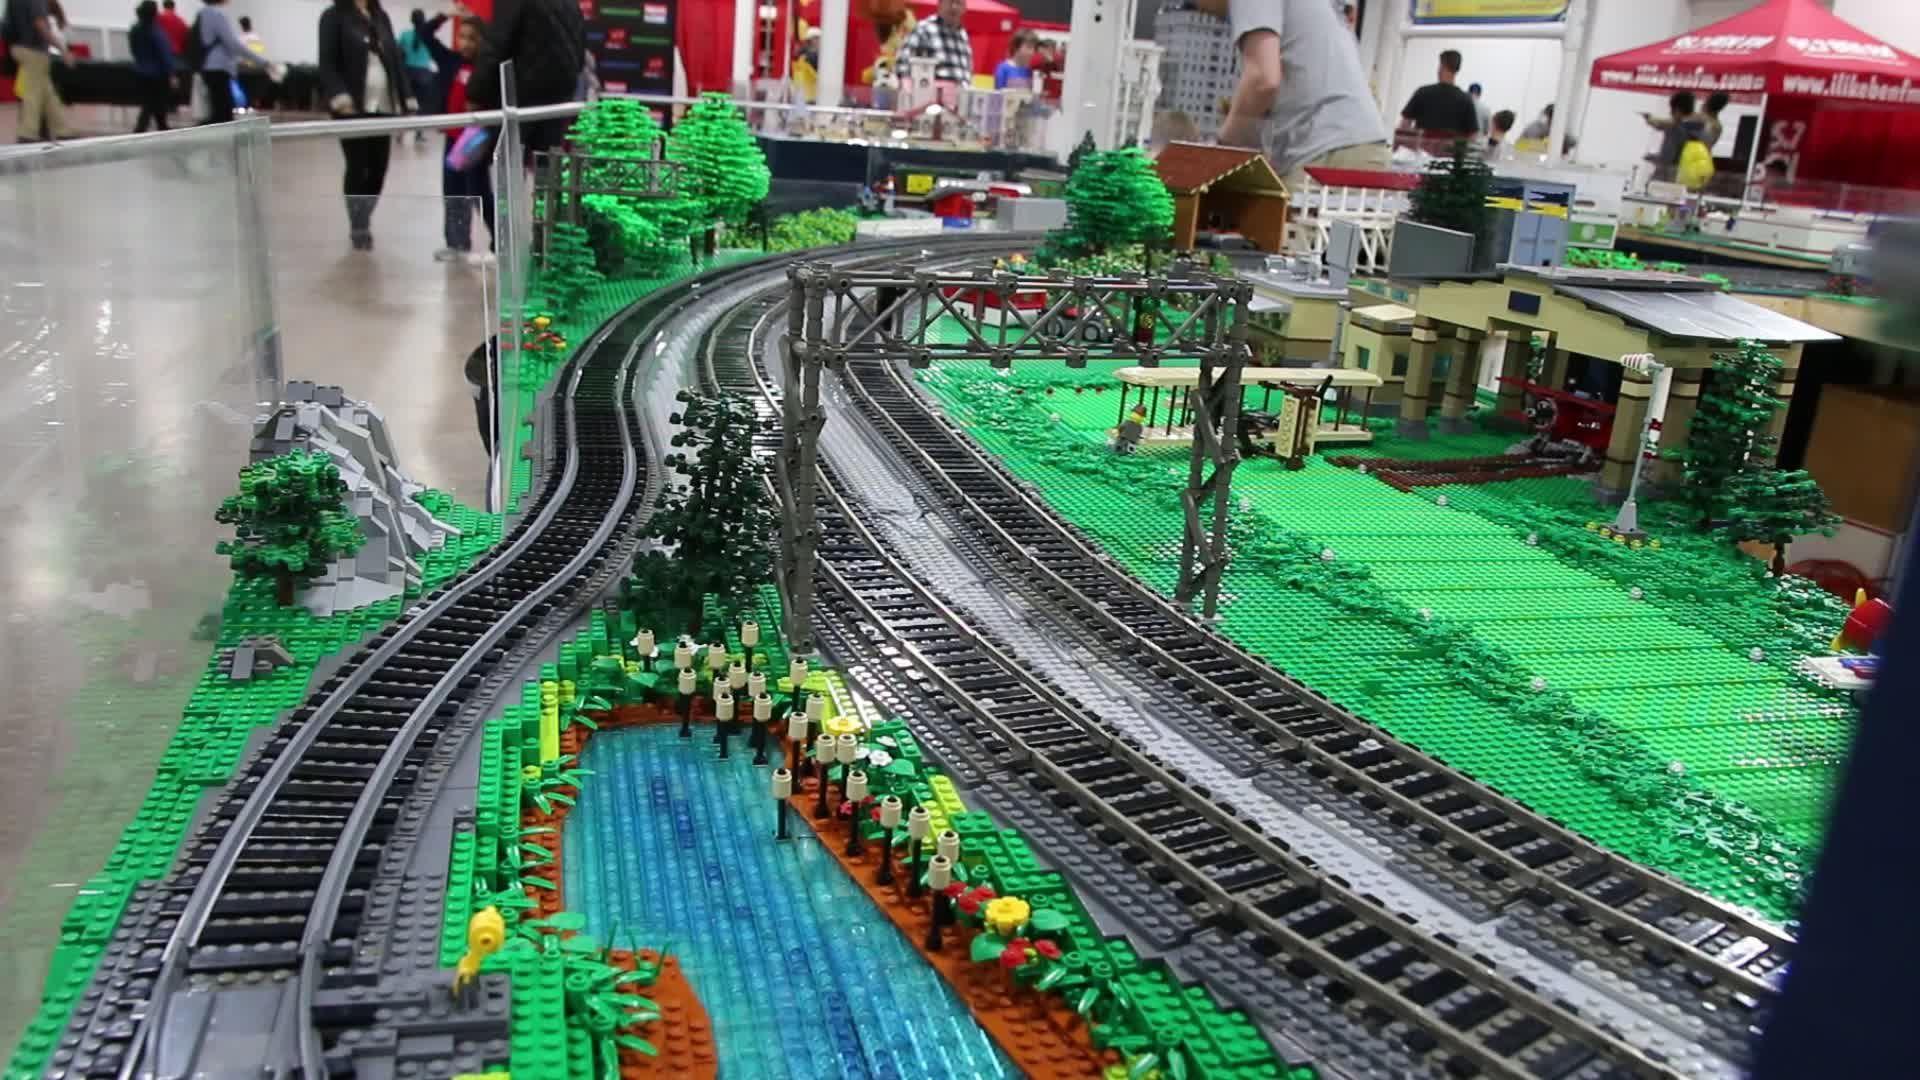 Mvi 5603 Lego City Train Lego Track Lego Trains